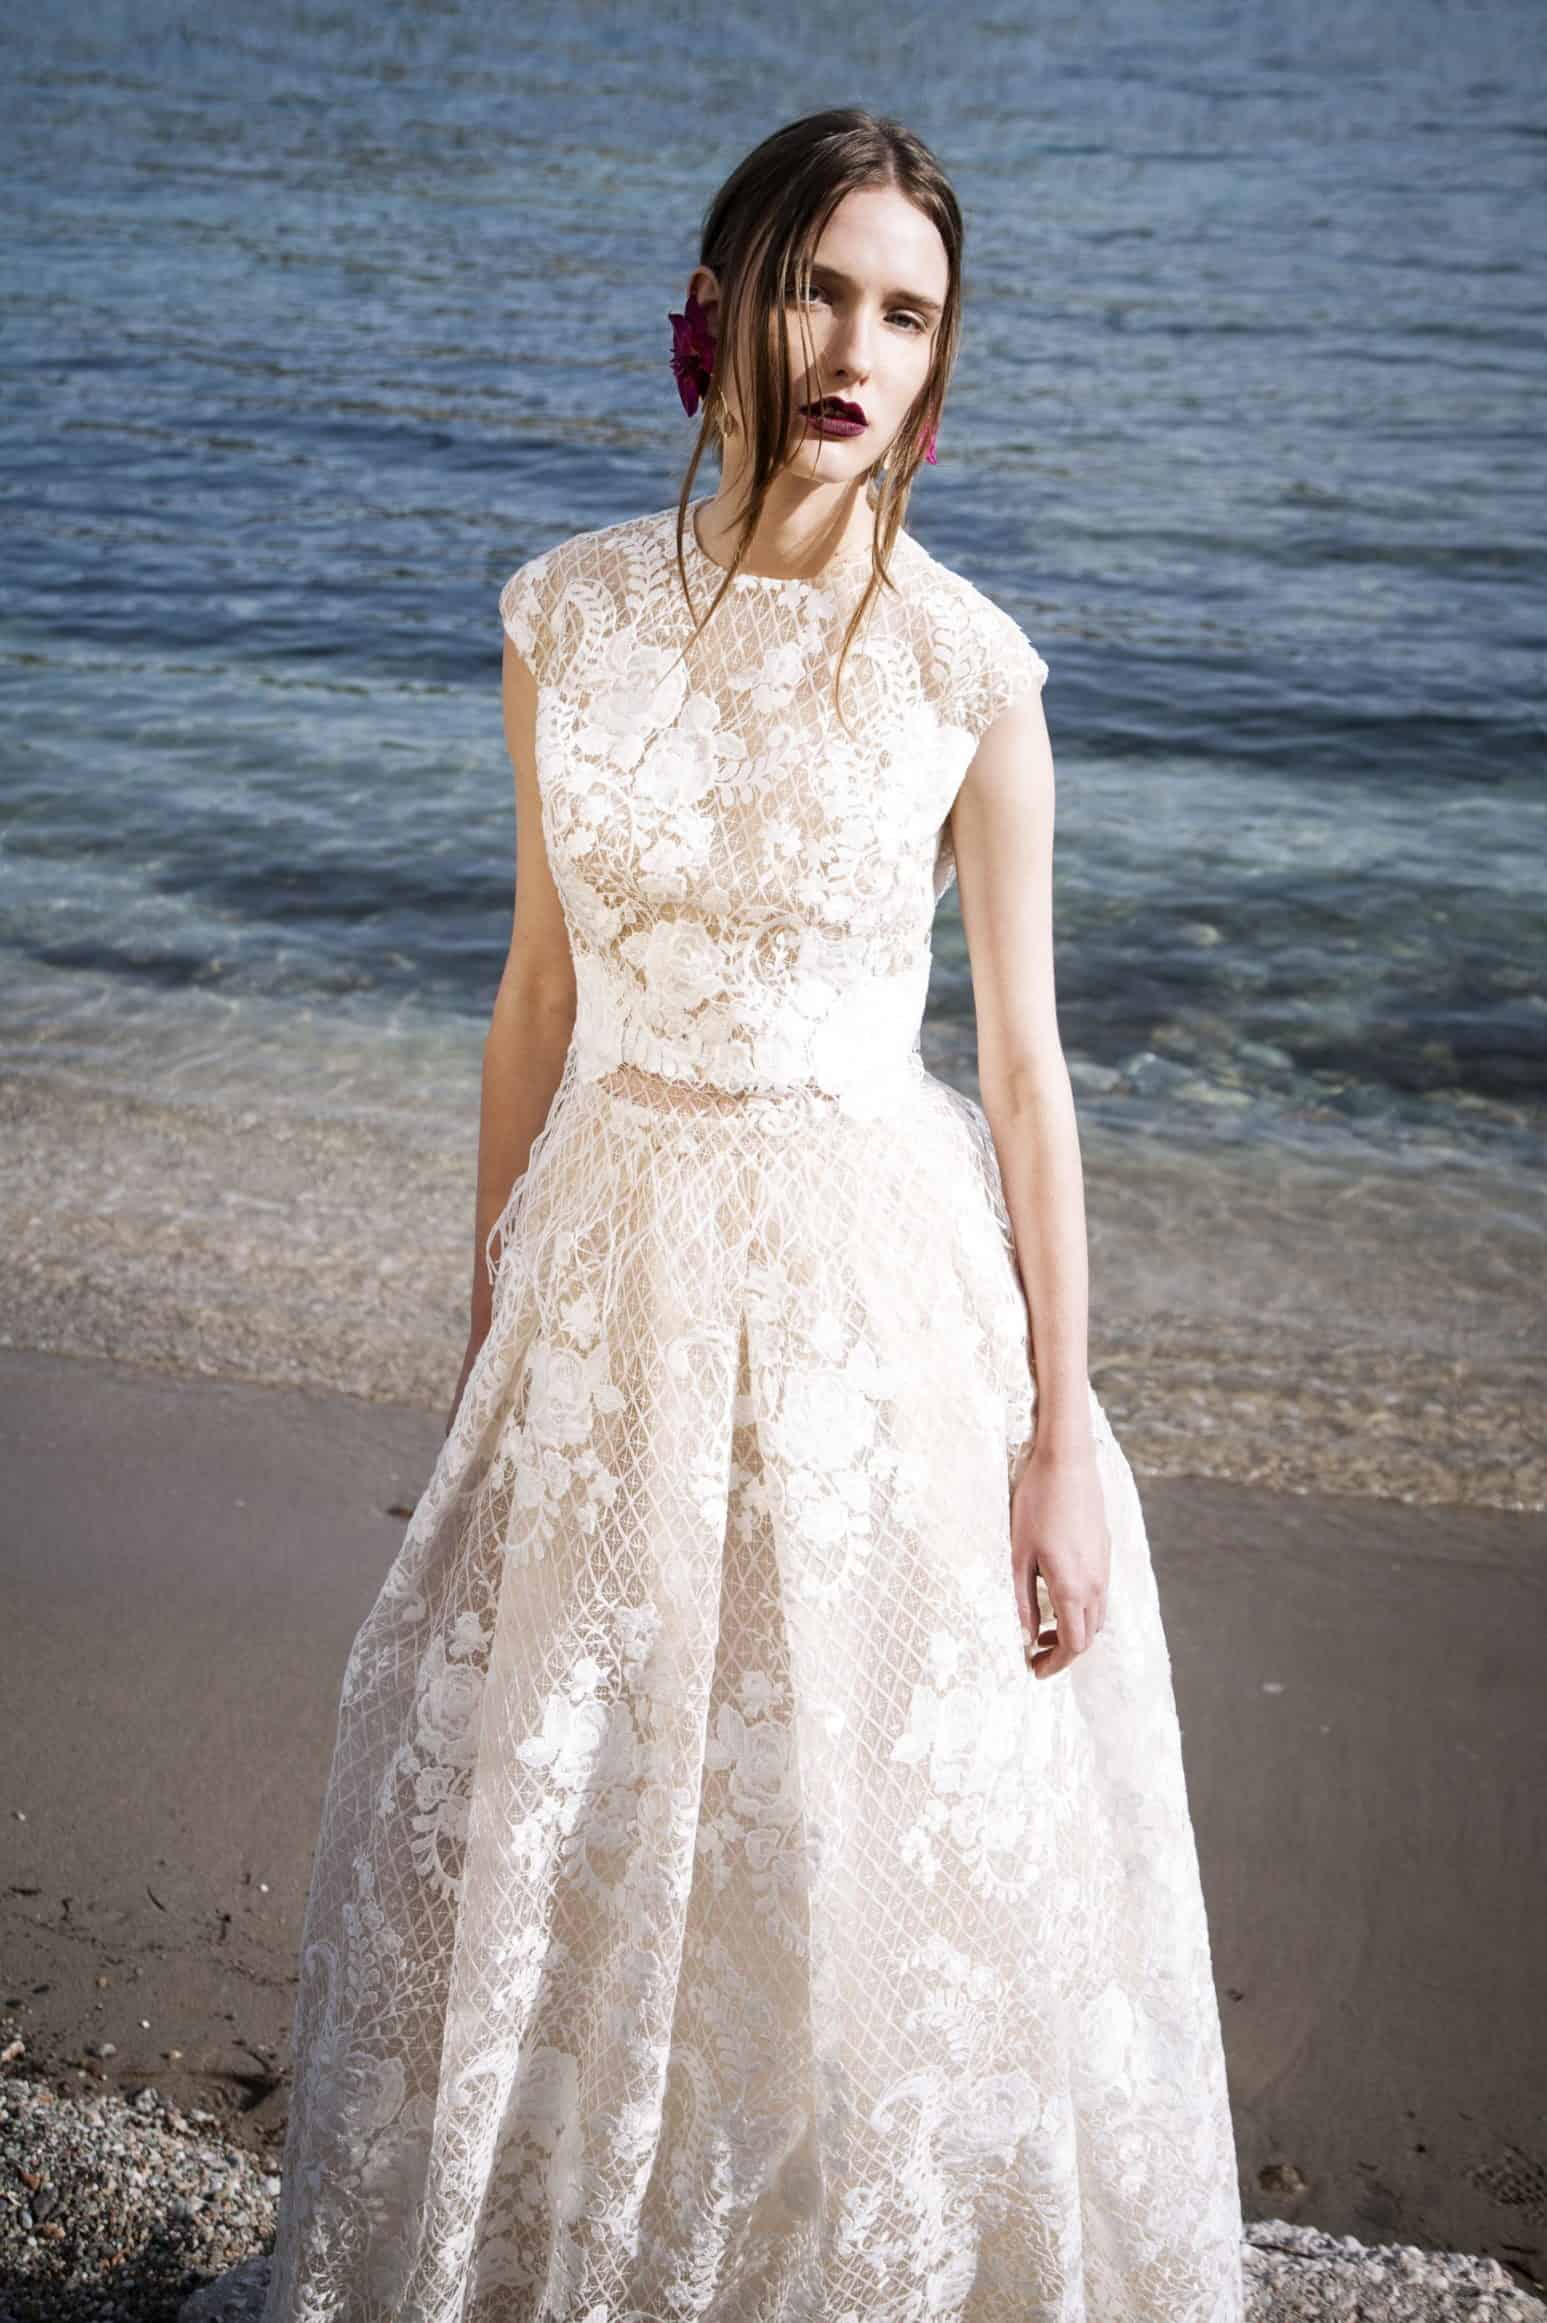 summer wedding at the beach